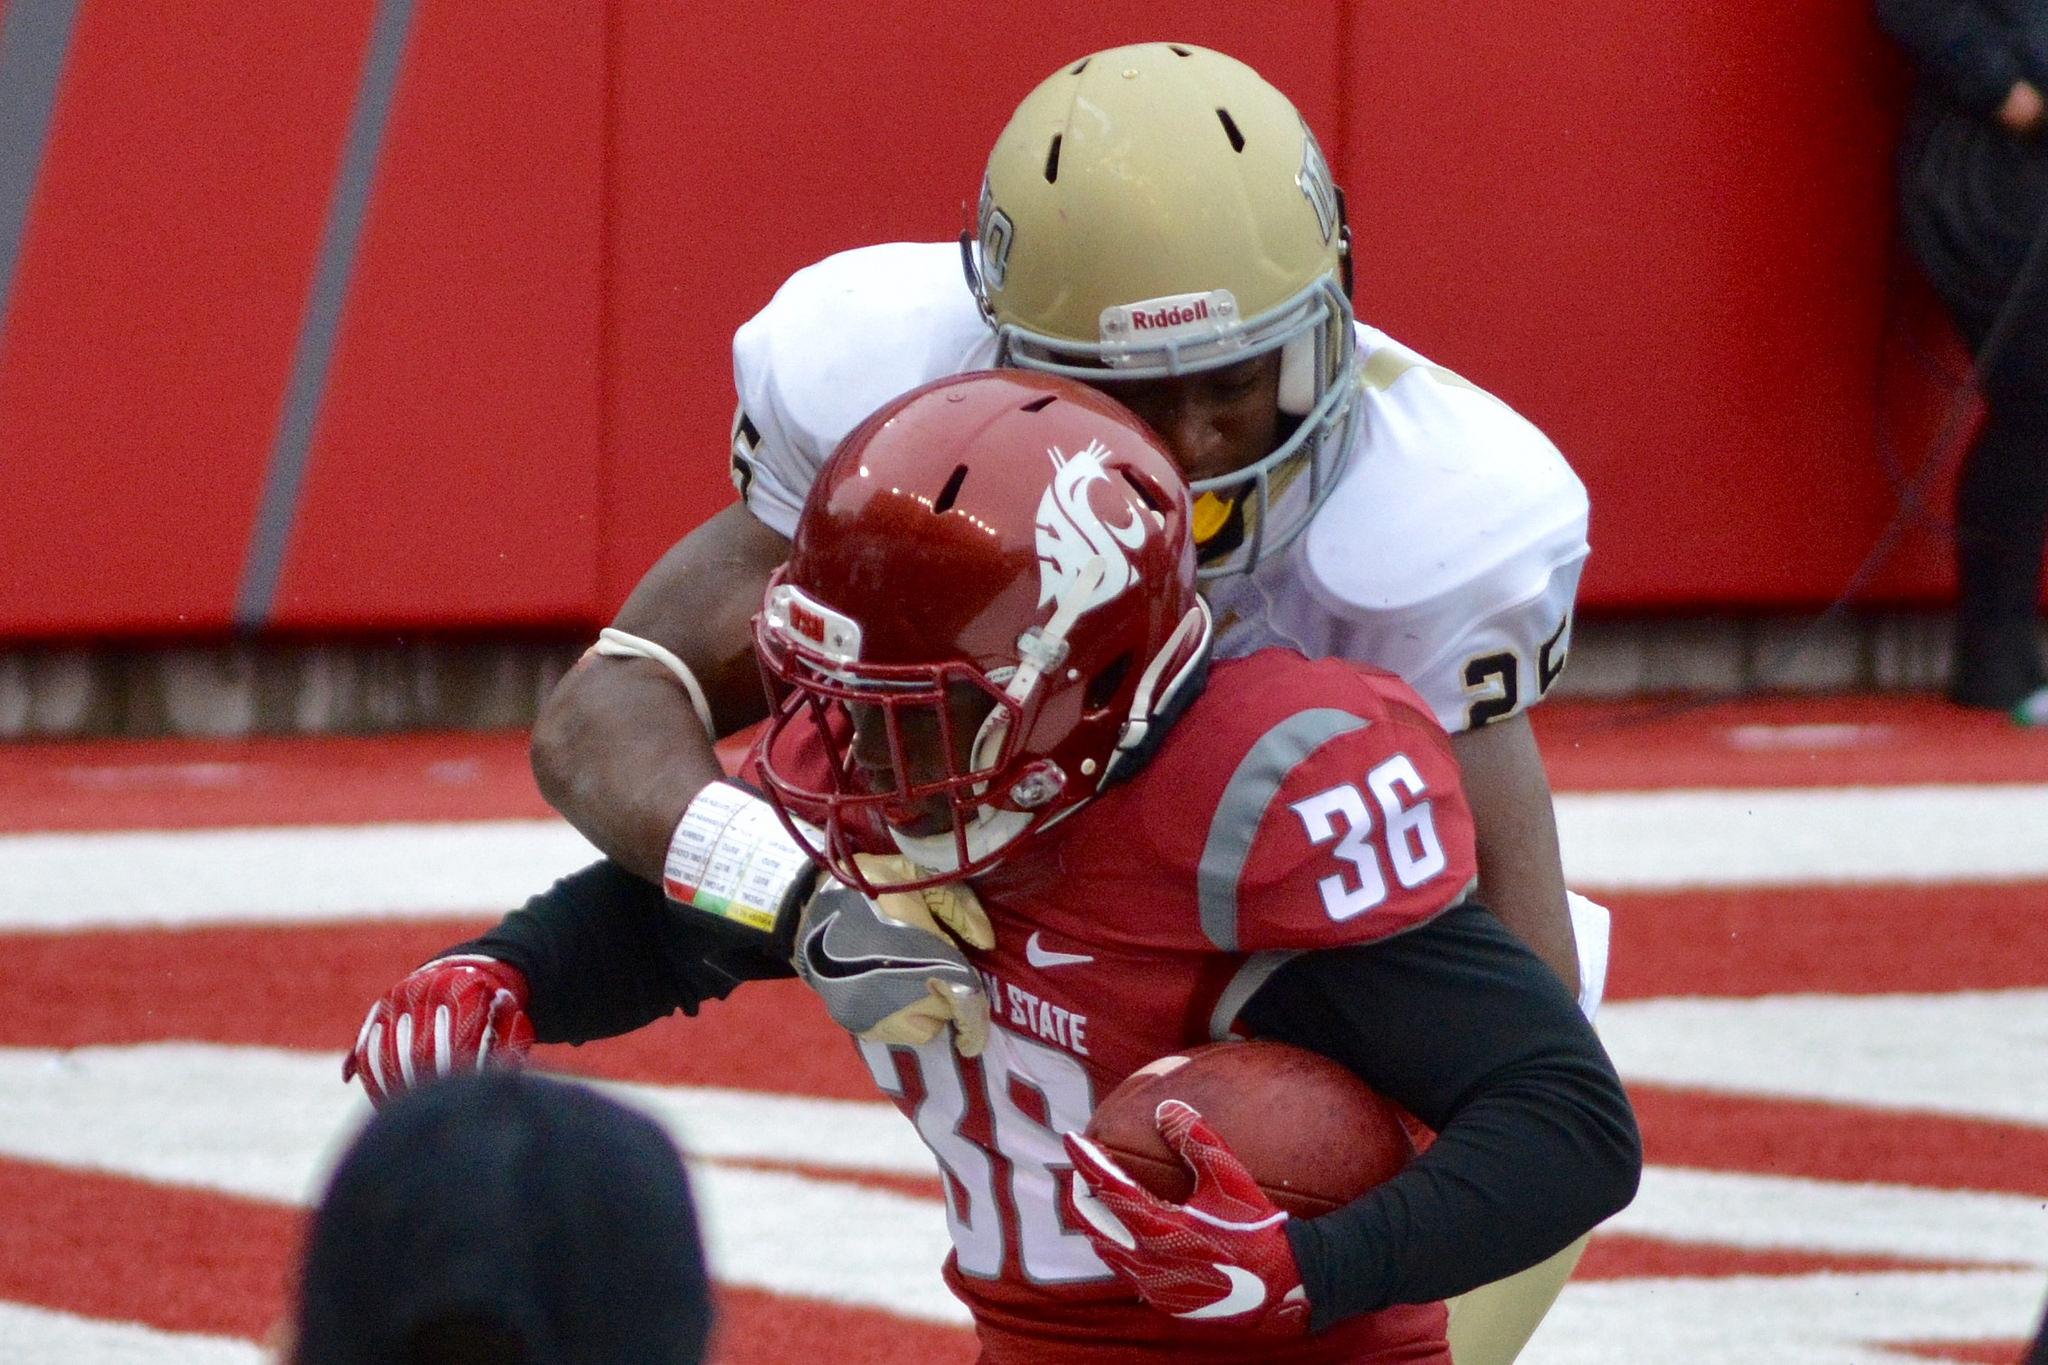 Washington State University Cougars vs Idaho Vandals football game